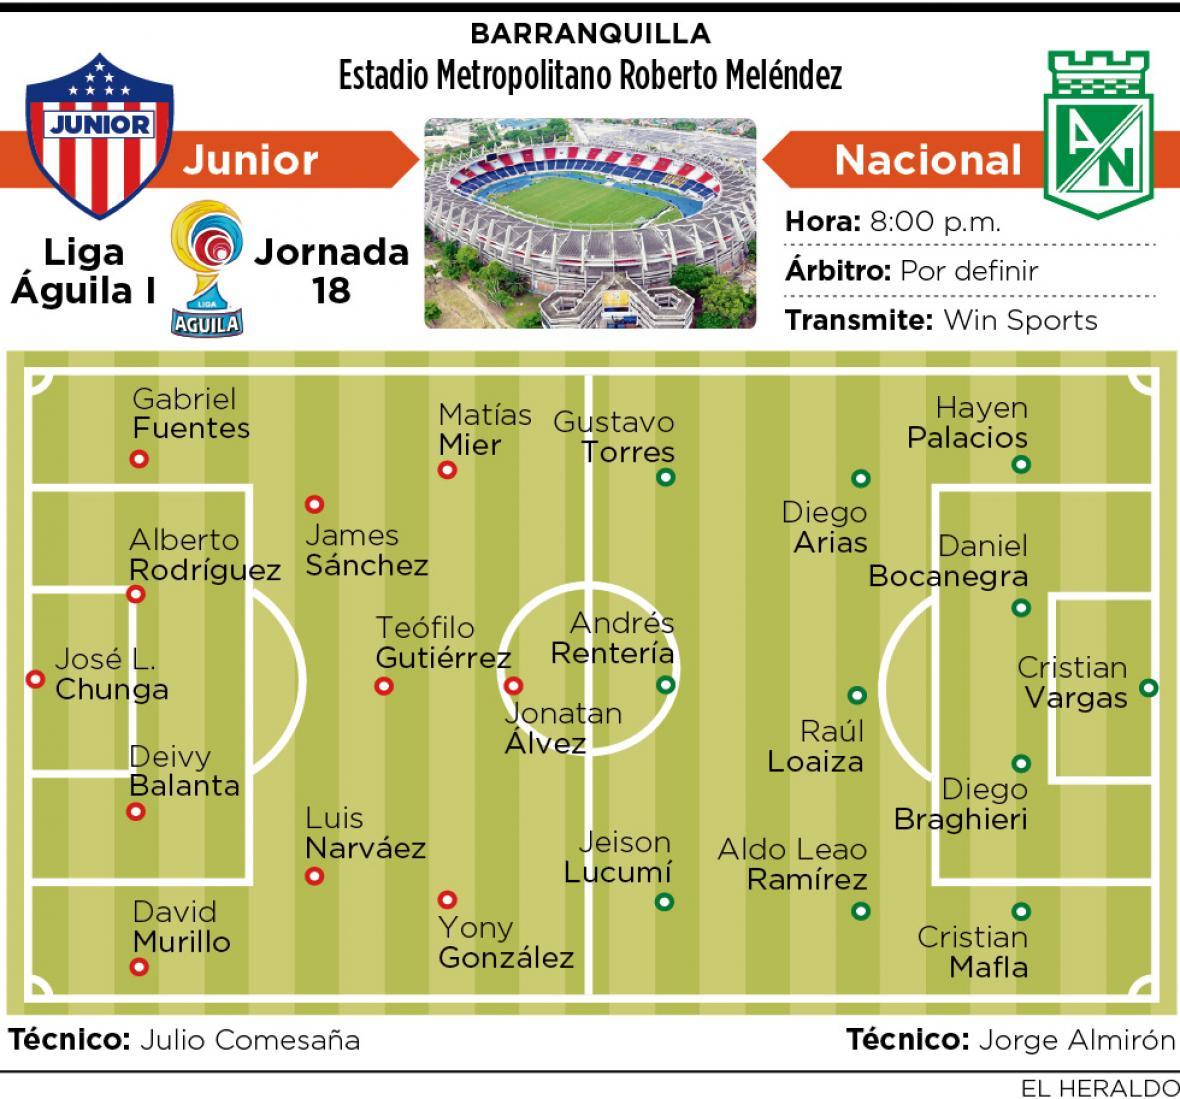 Múltiples cambios para enfrentar a Junior de Barranquilla — Atlético Nacional